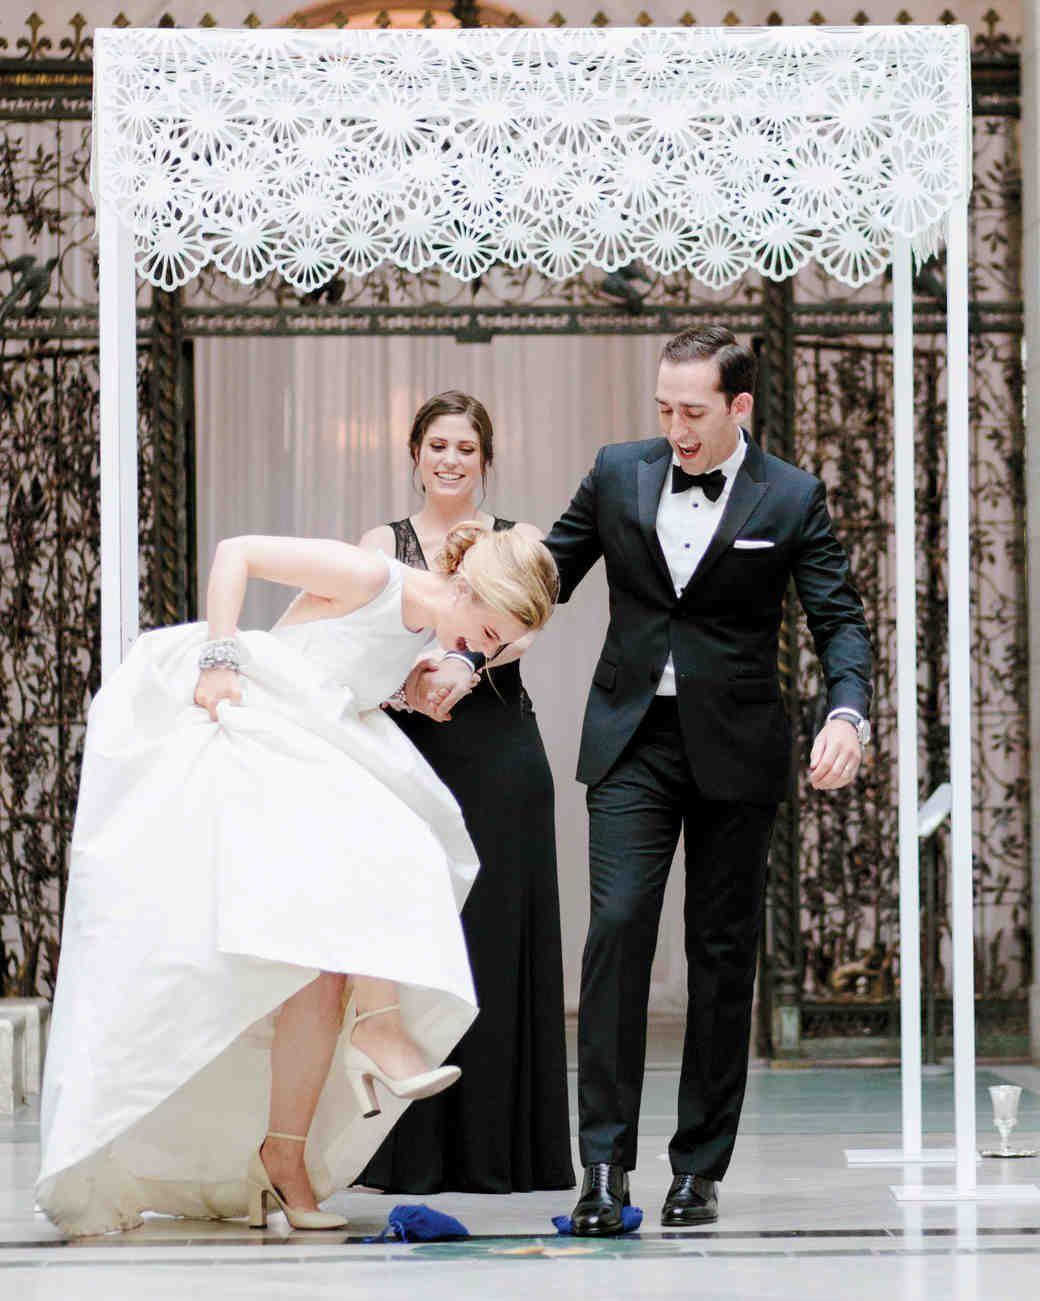 51 Beautiful Chuppahs from Jewish Weddings Wedding